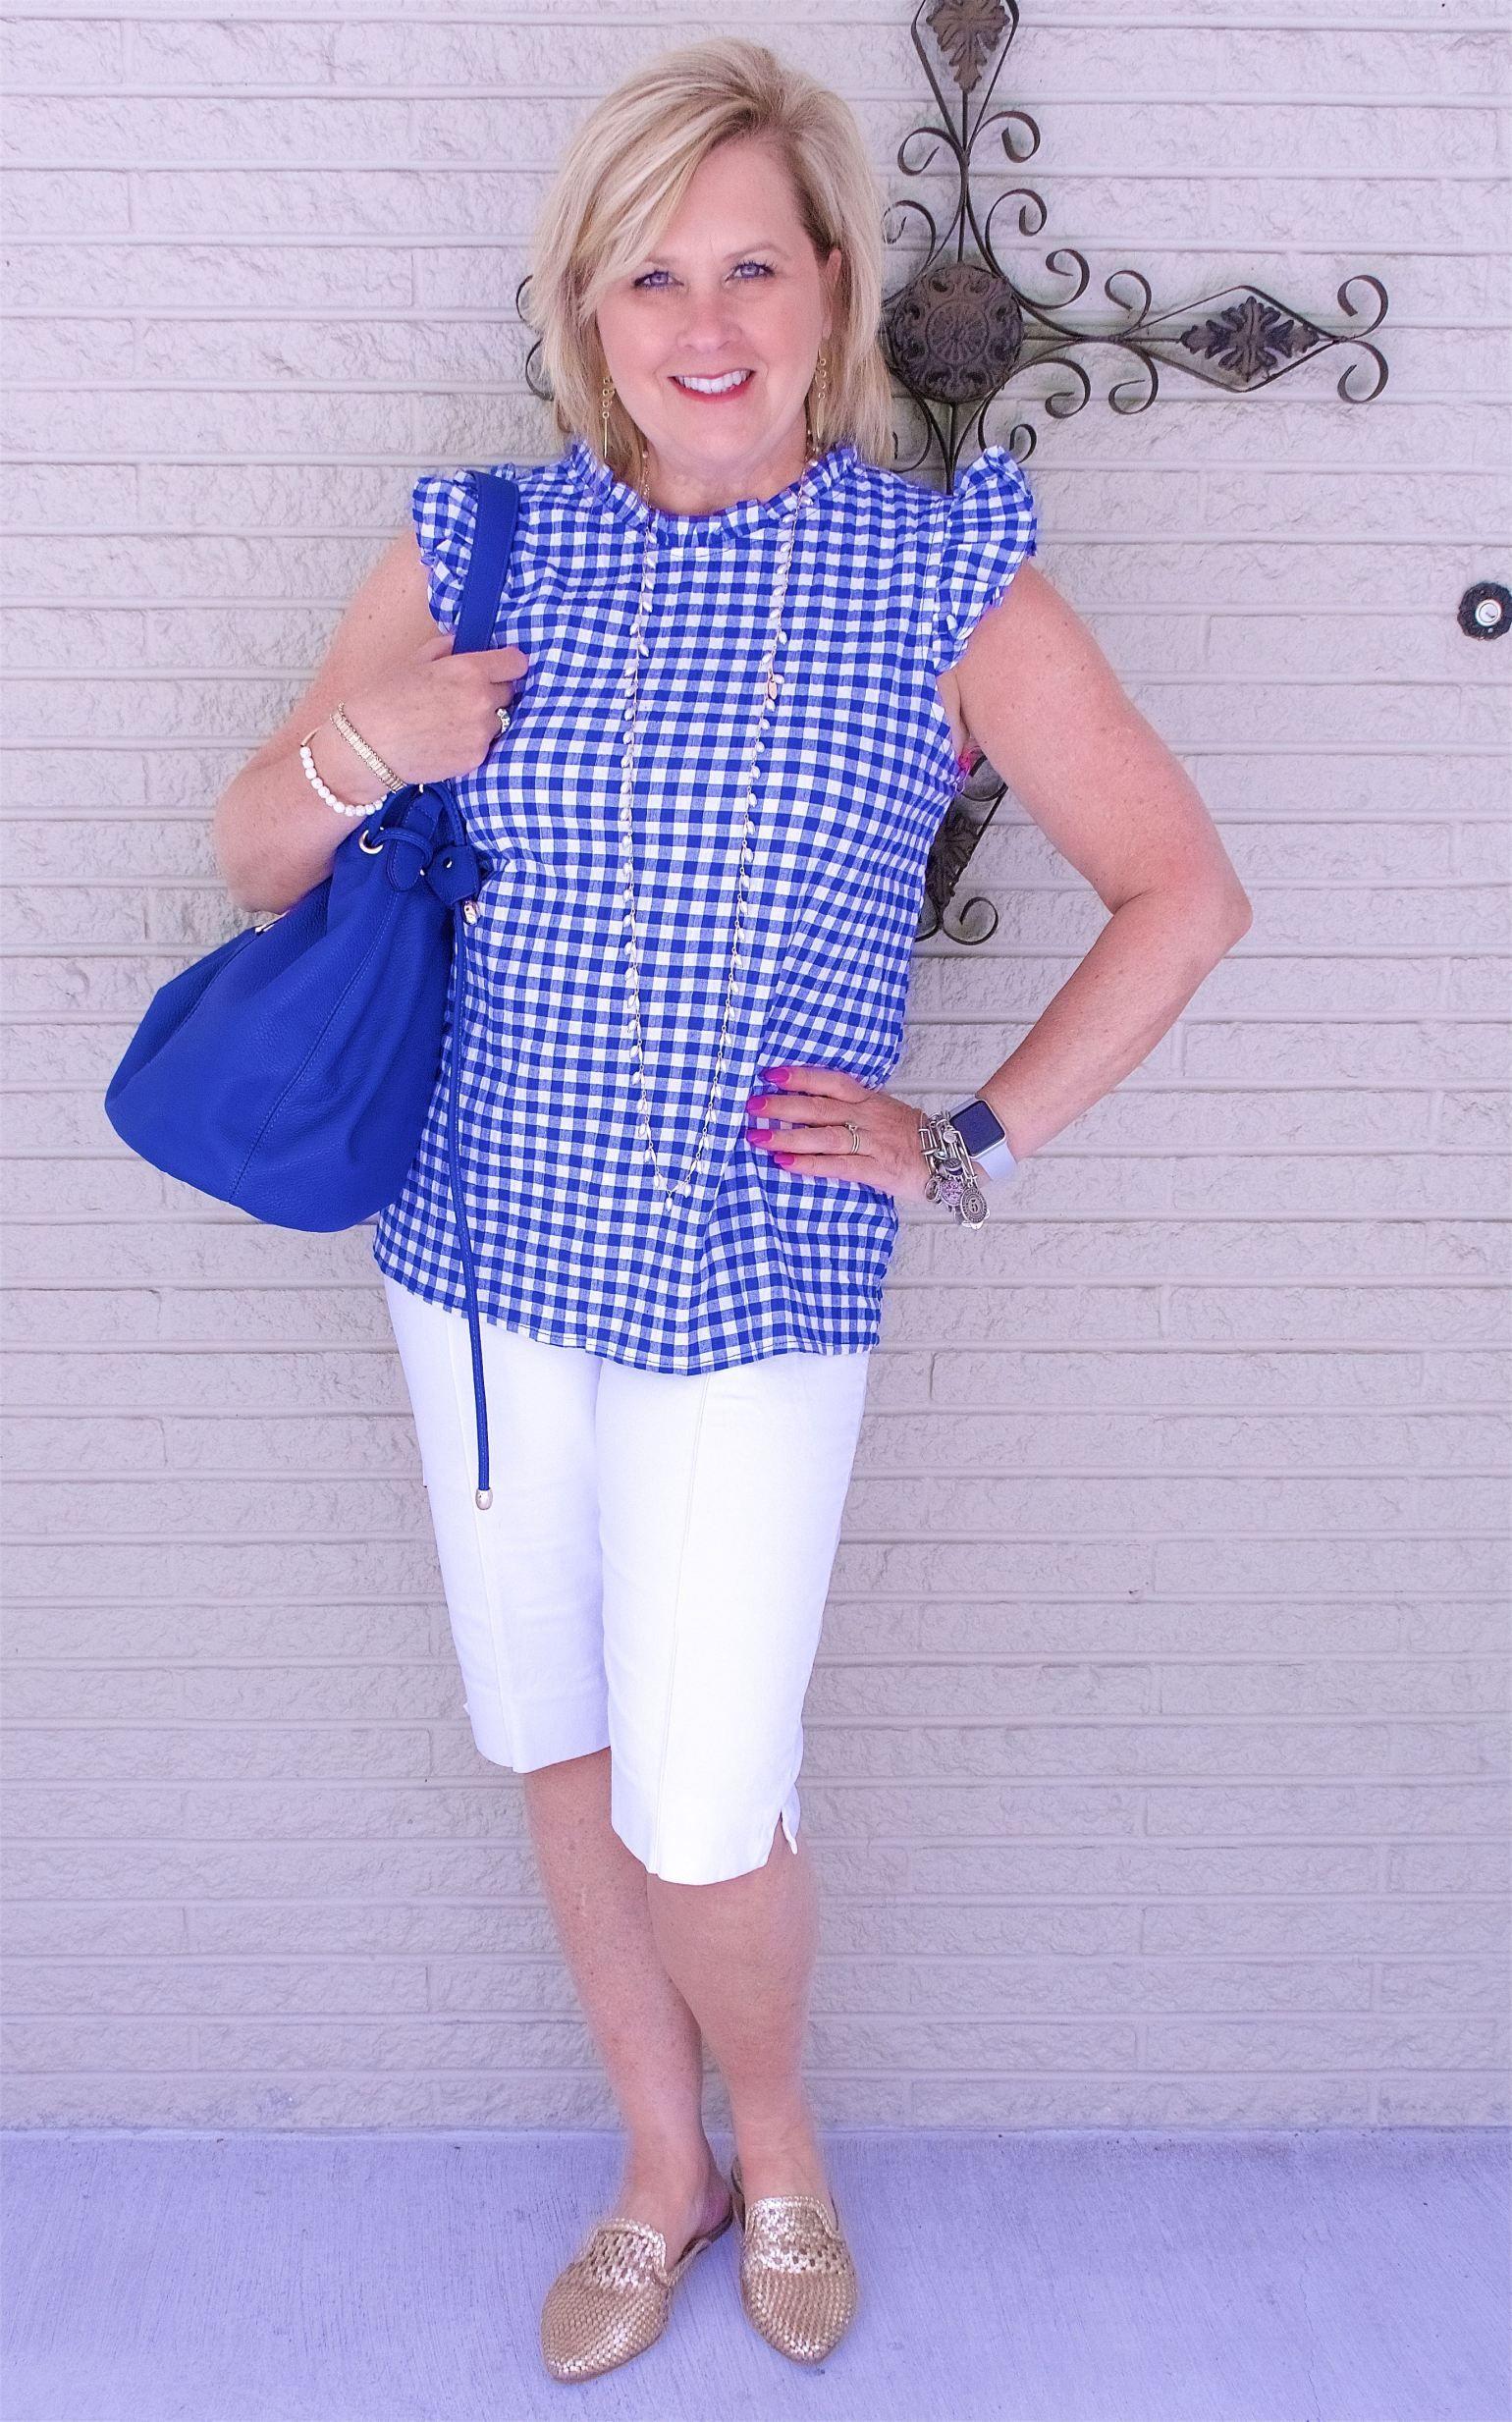 e873dc46a9c5 WEARING BERMUDA SHORTS | My Style | Bermuda shorts, How to wear, Fashion